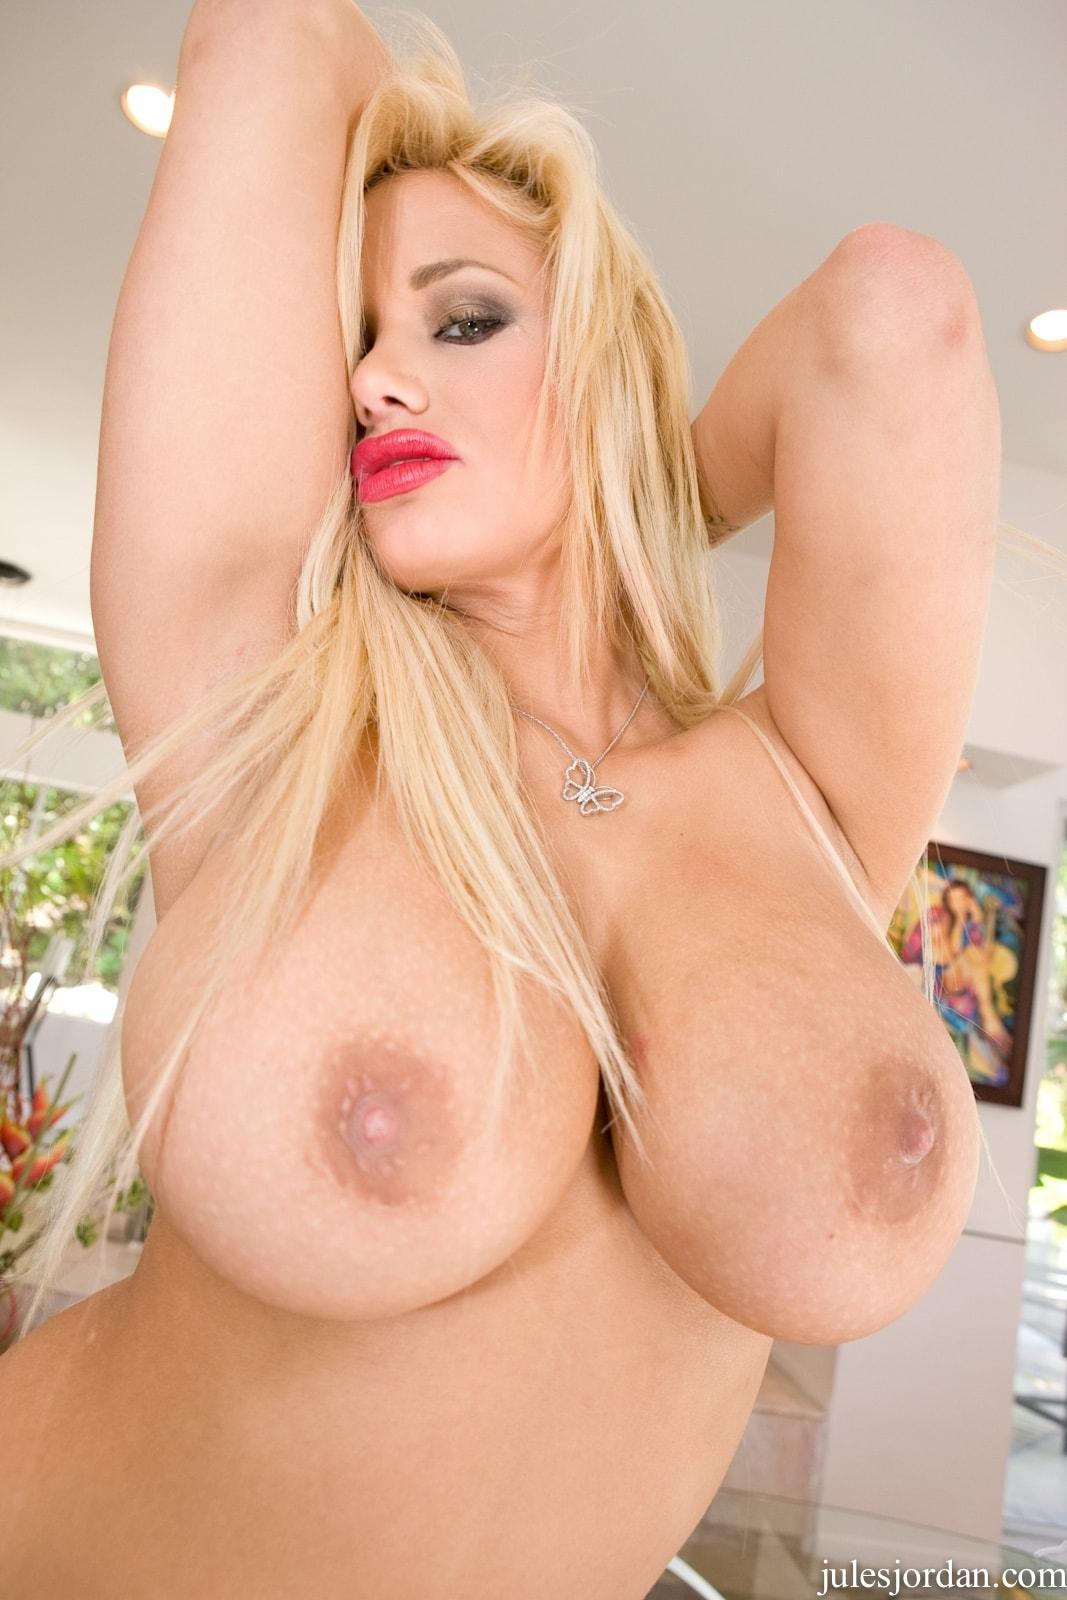 Jules Jordan 'Anal Titty Fuck' starring Shyla Stylez (Photo 10)